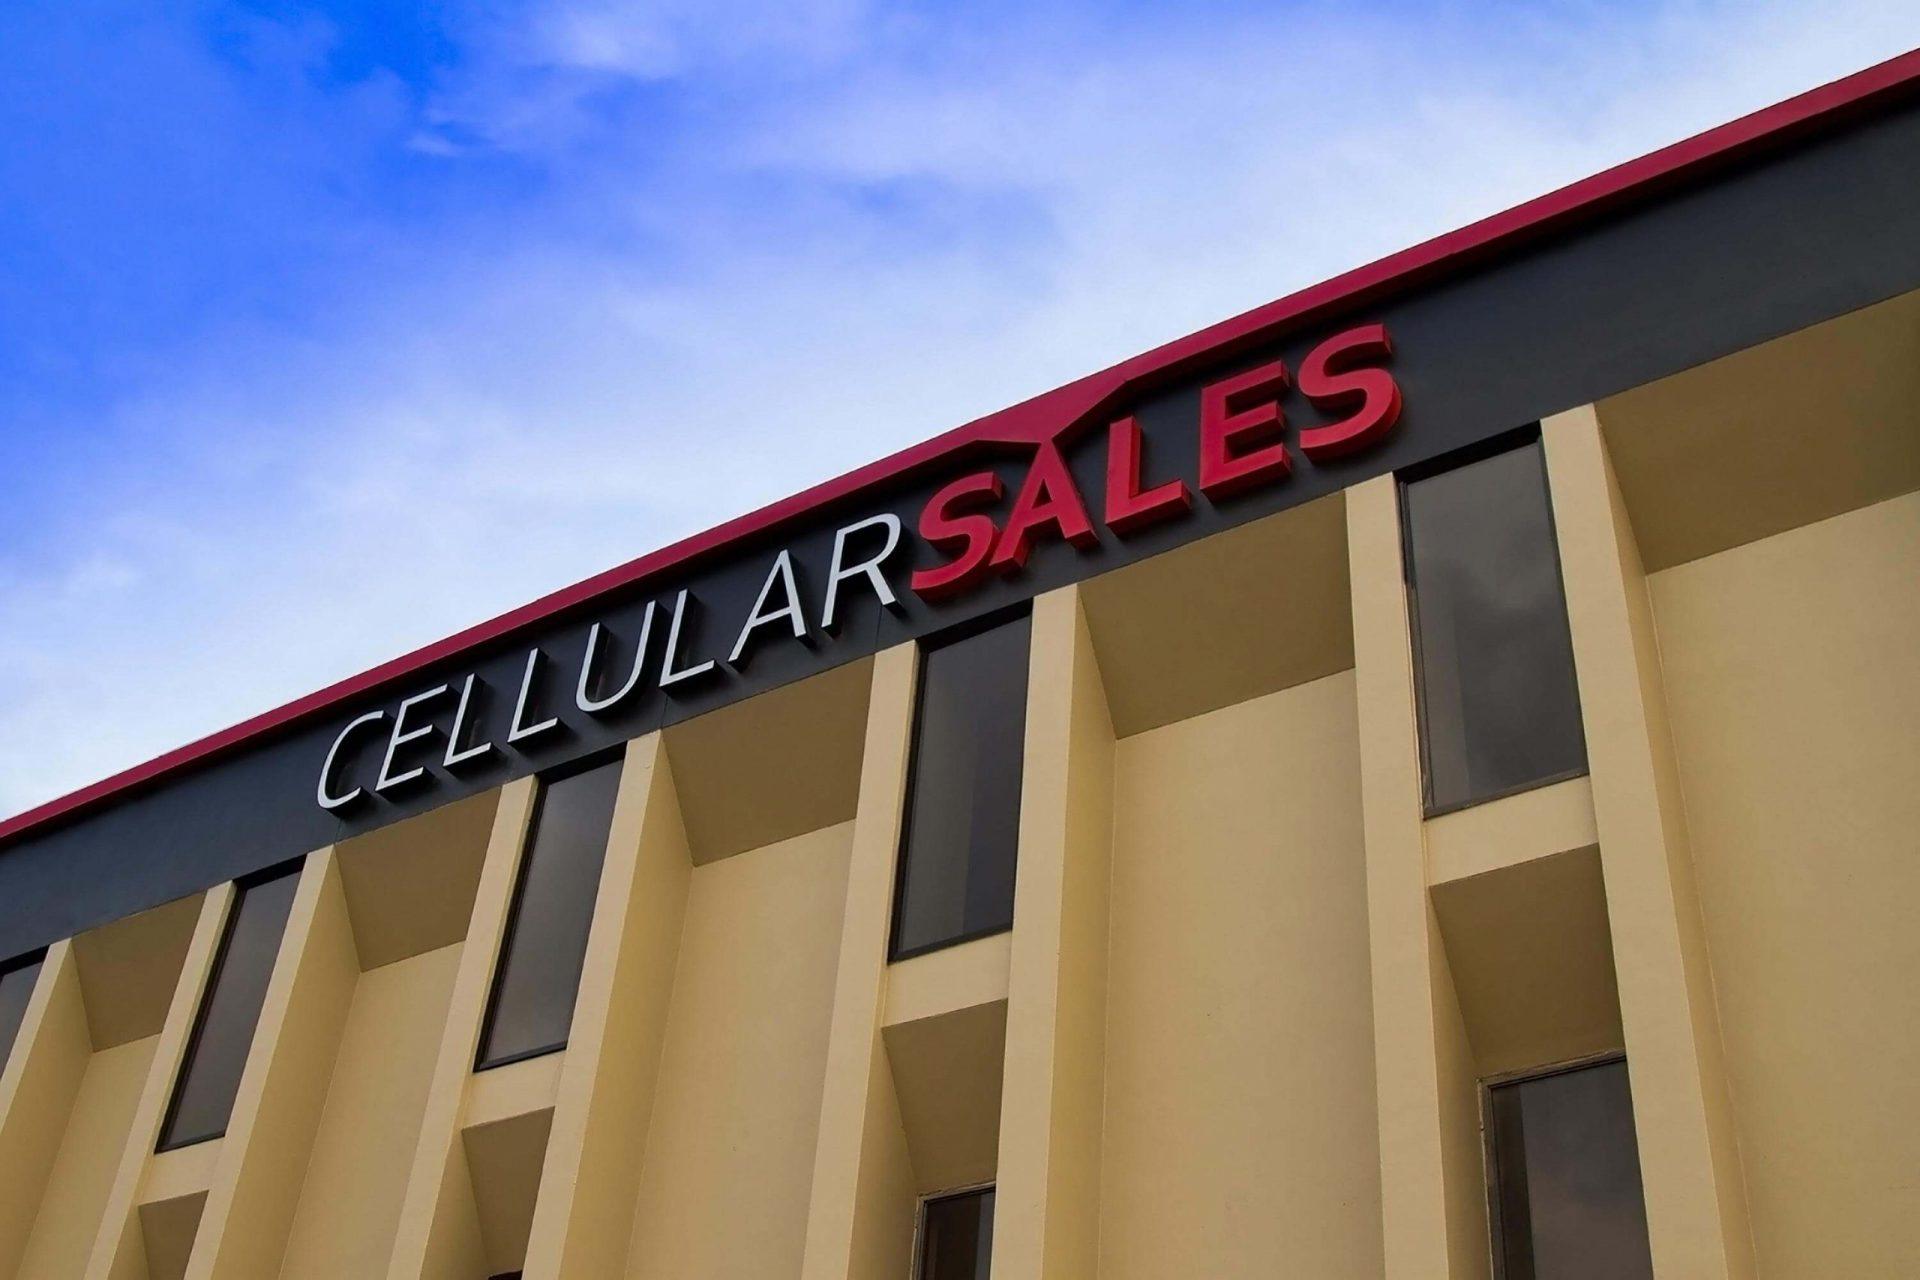 Cellular Sales Corporate Office